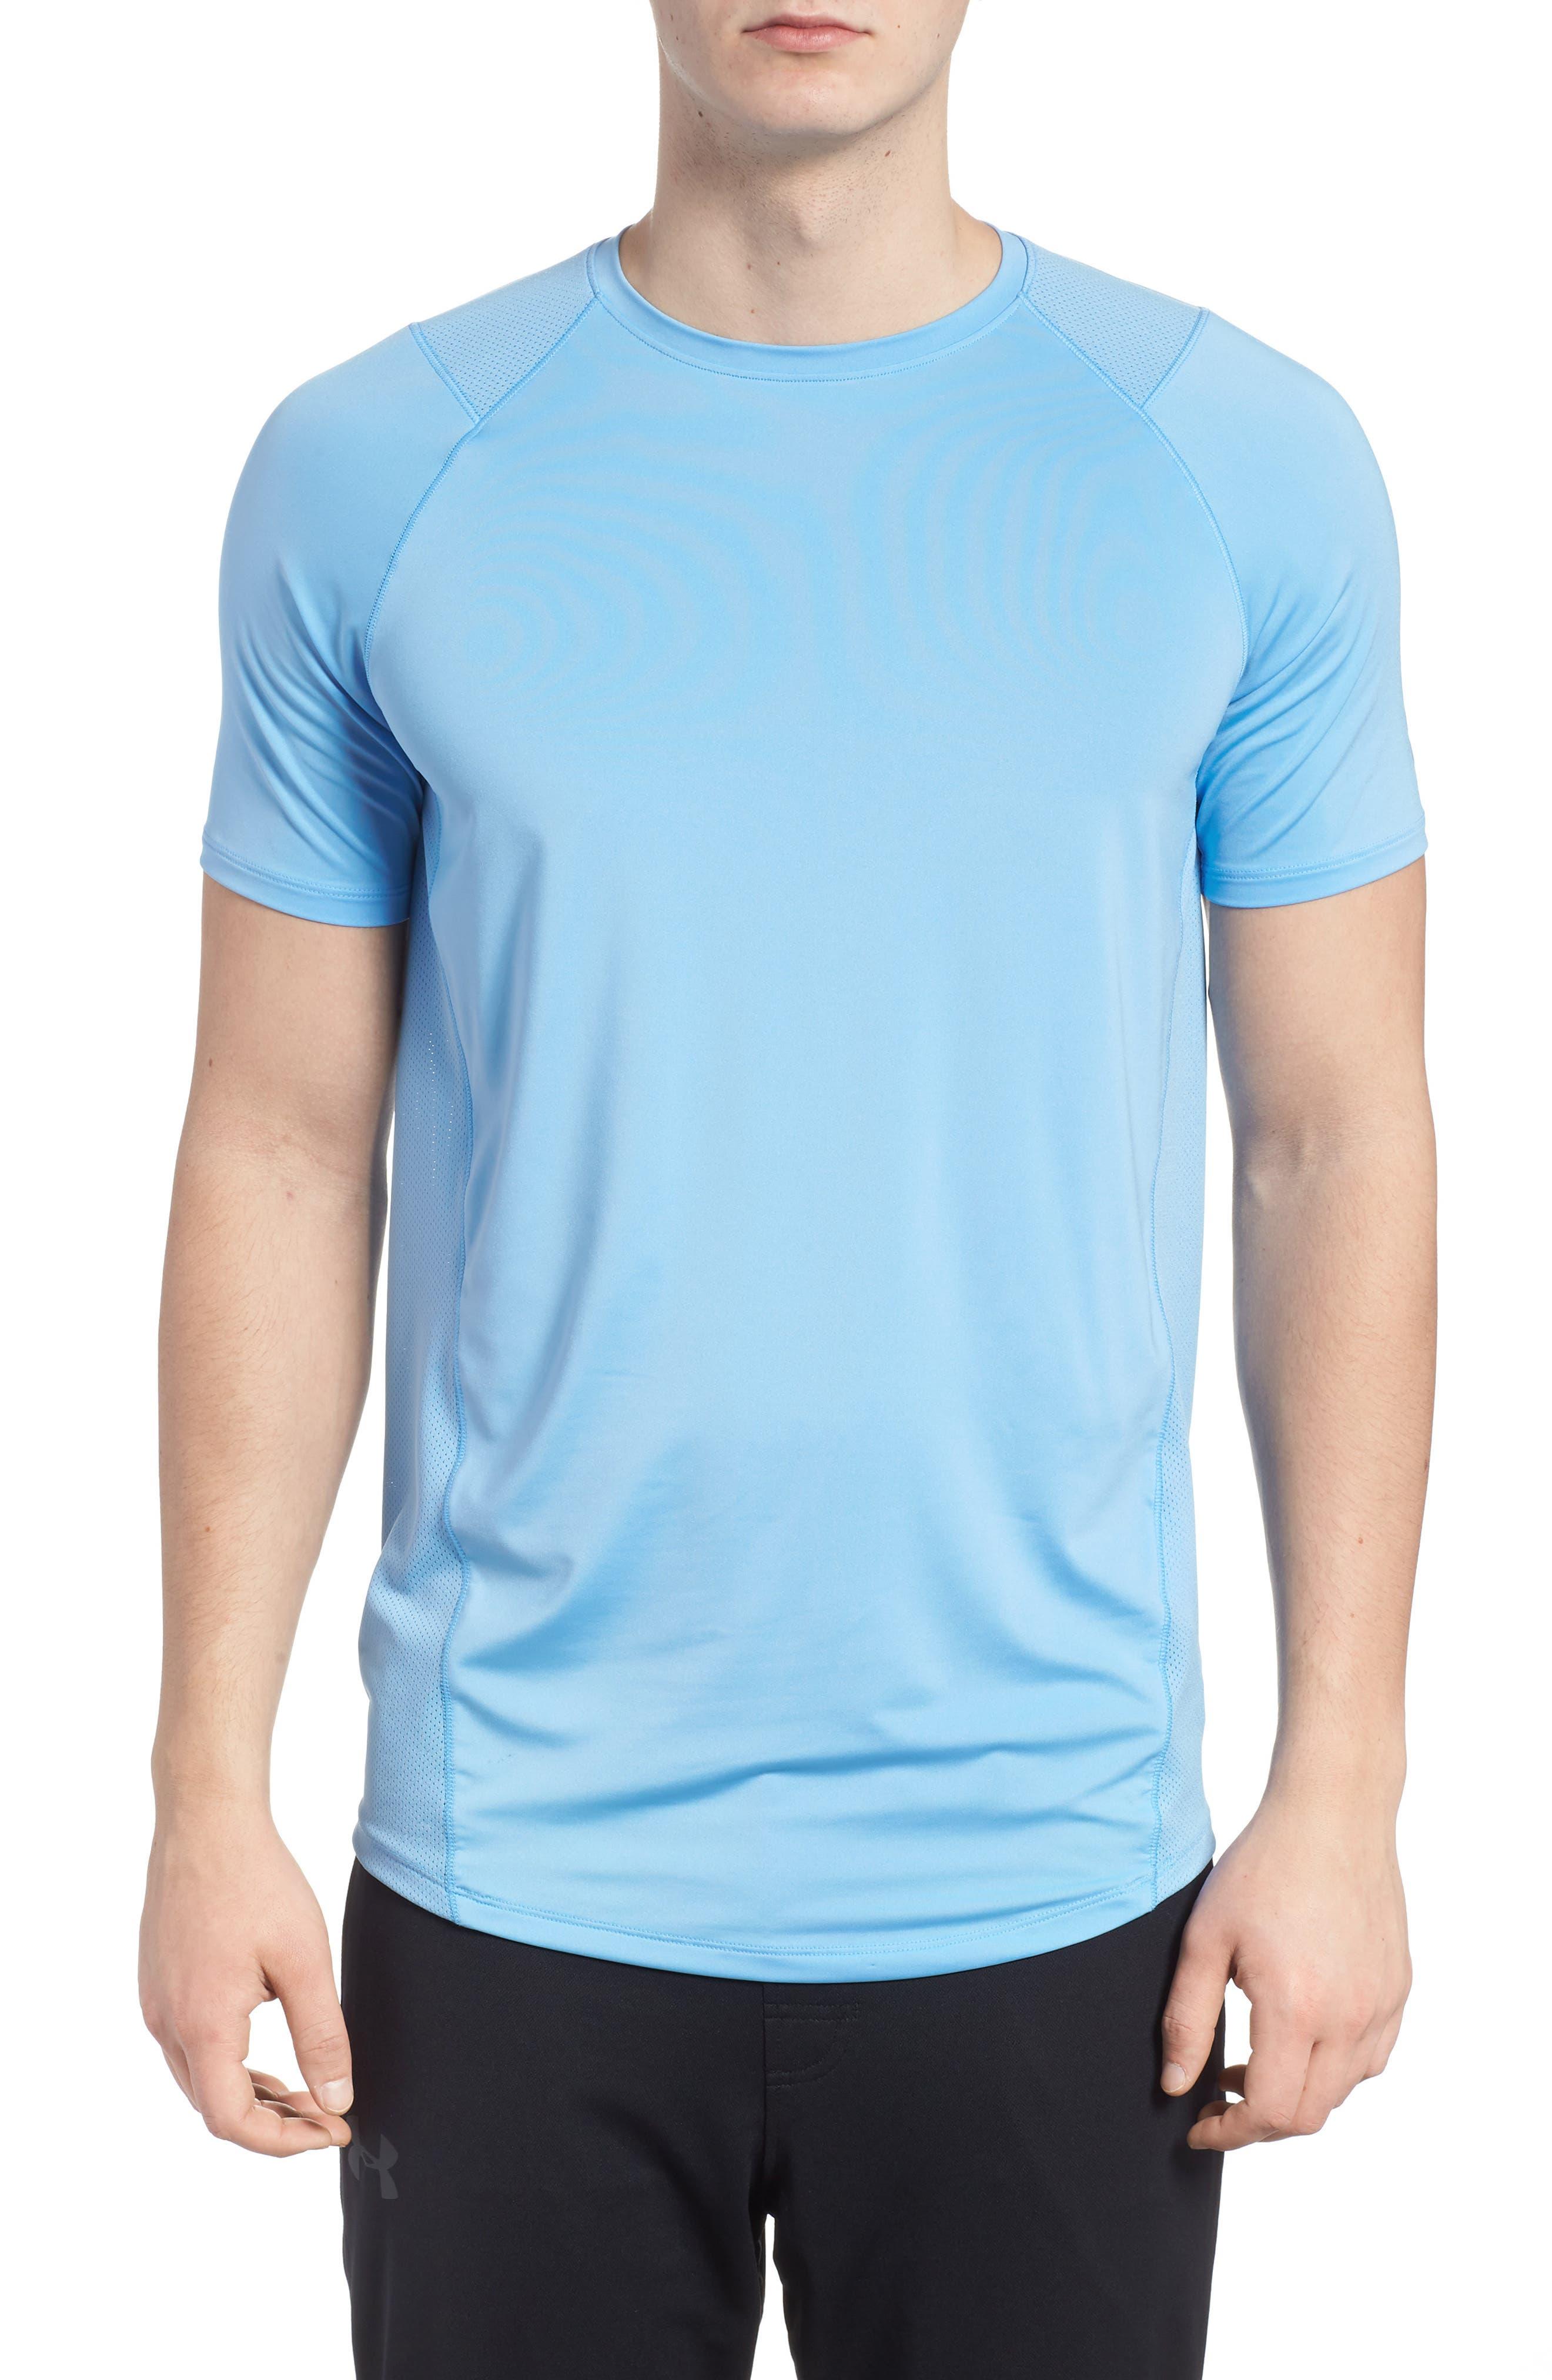 Raid 2.0 Crewneck T-Shirt,                             Main thumbnail 1, color,                             Carolina Blue/ Steel